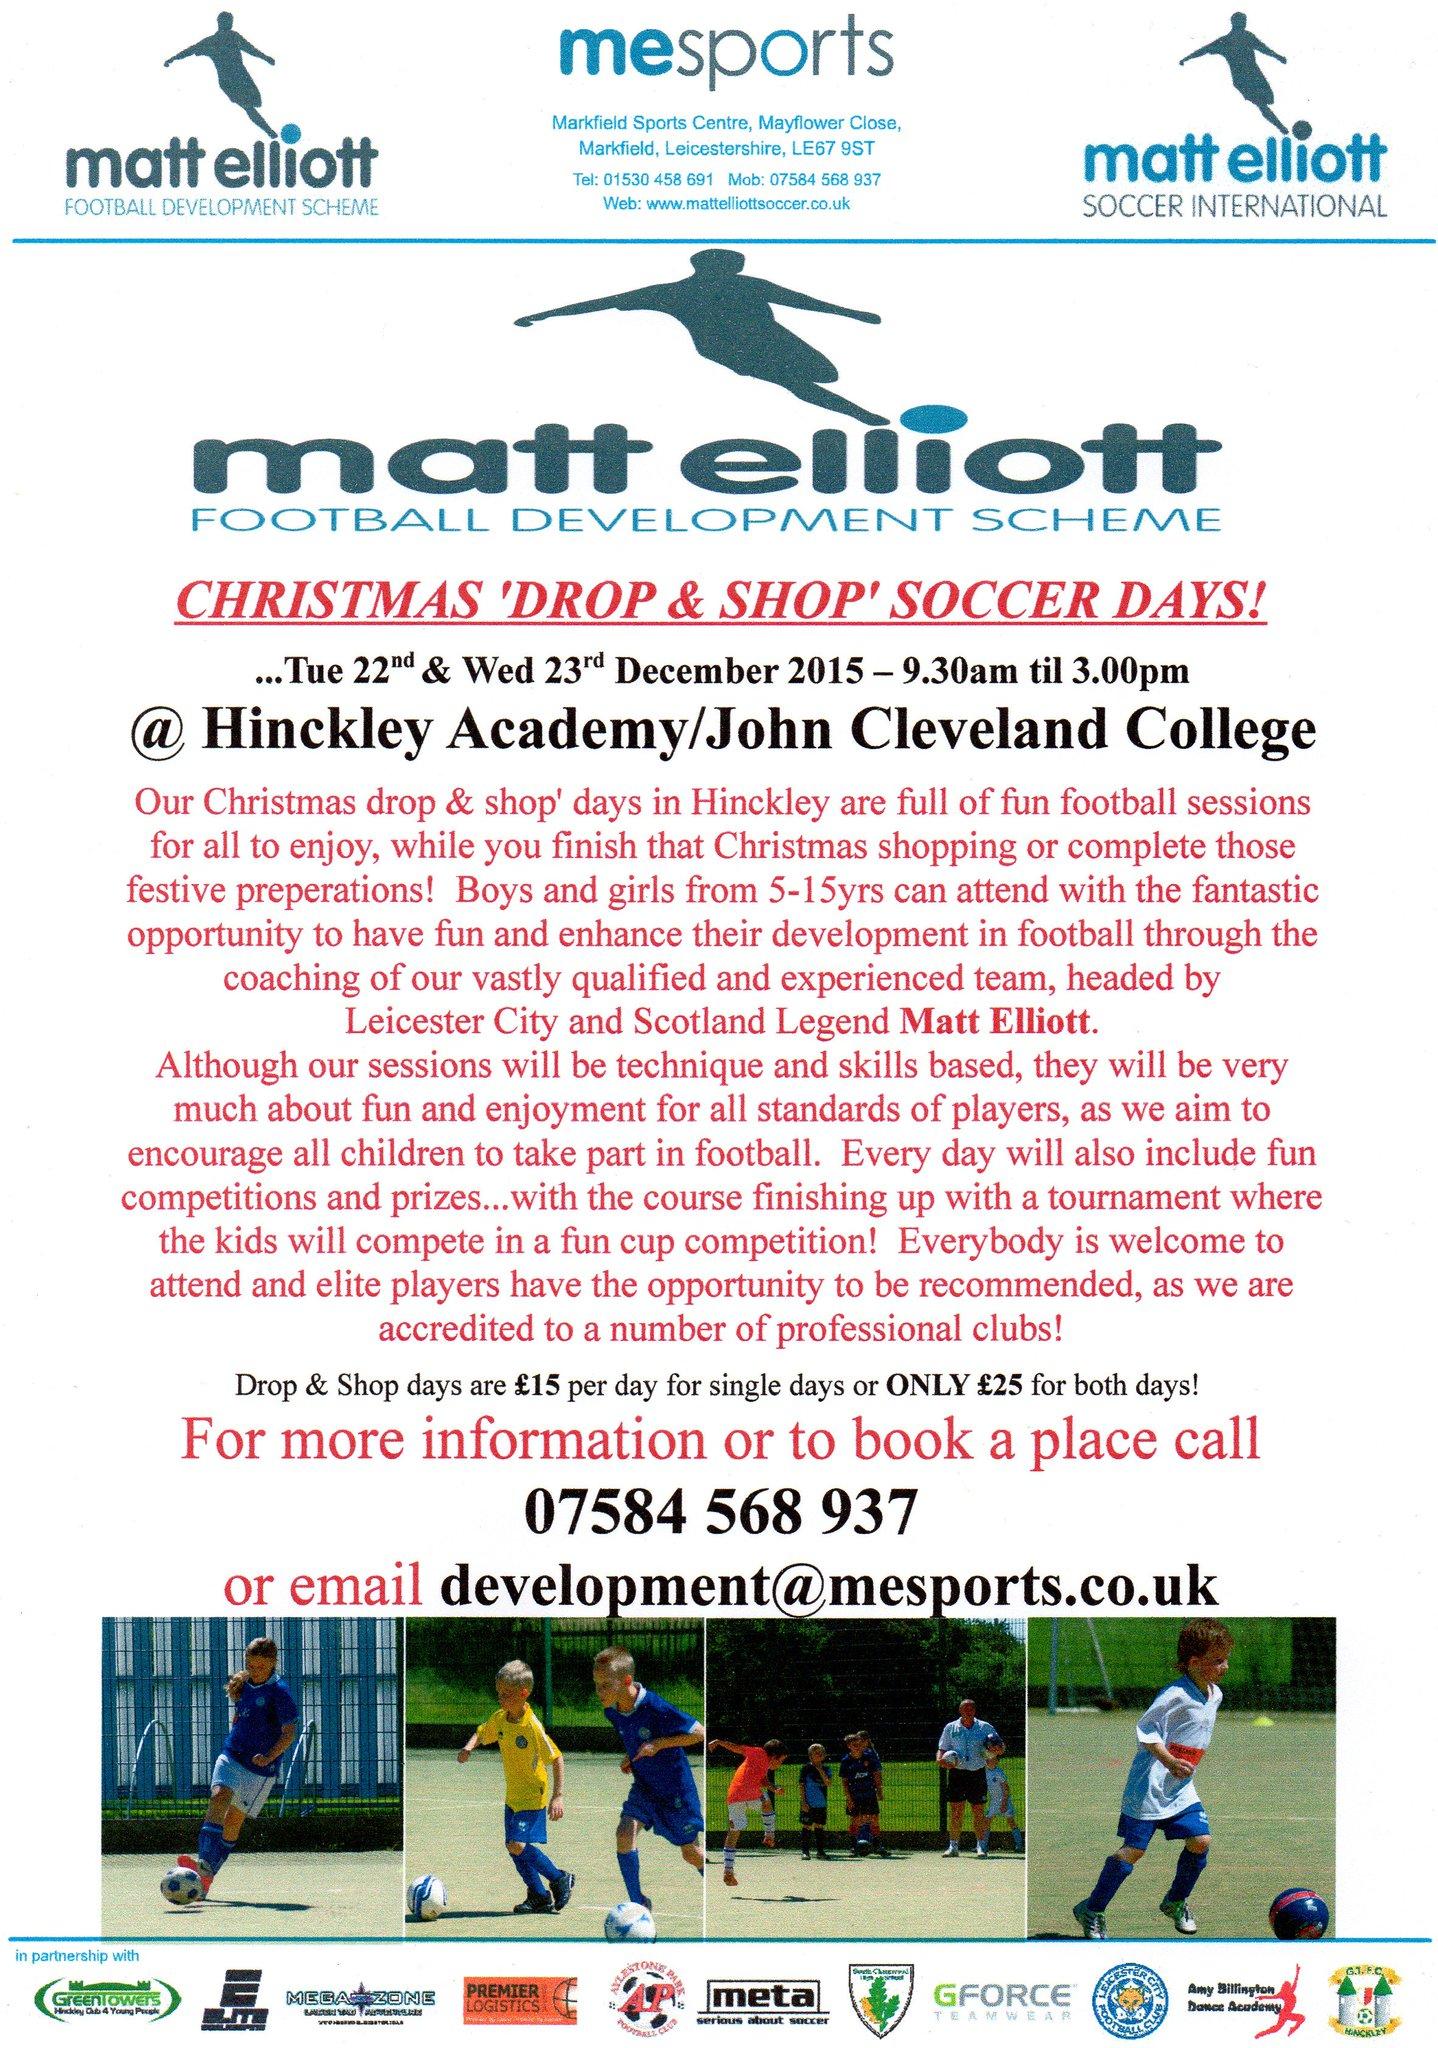 RT @MElliottSoccer: CHRISTMAS 'DROP & SHOP' SOCCER DAYS - 22nd & 23rd Dec @ HINCKLEY ACADEMY/JCC for 4-15yrs boys & girls...All Welcome! ht…